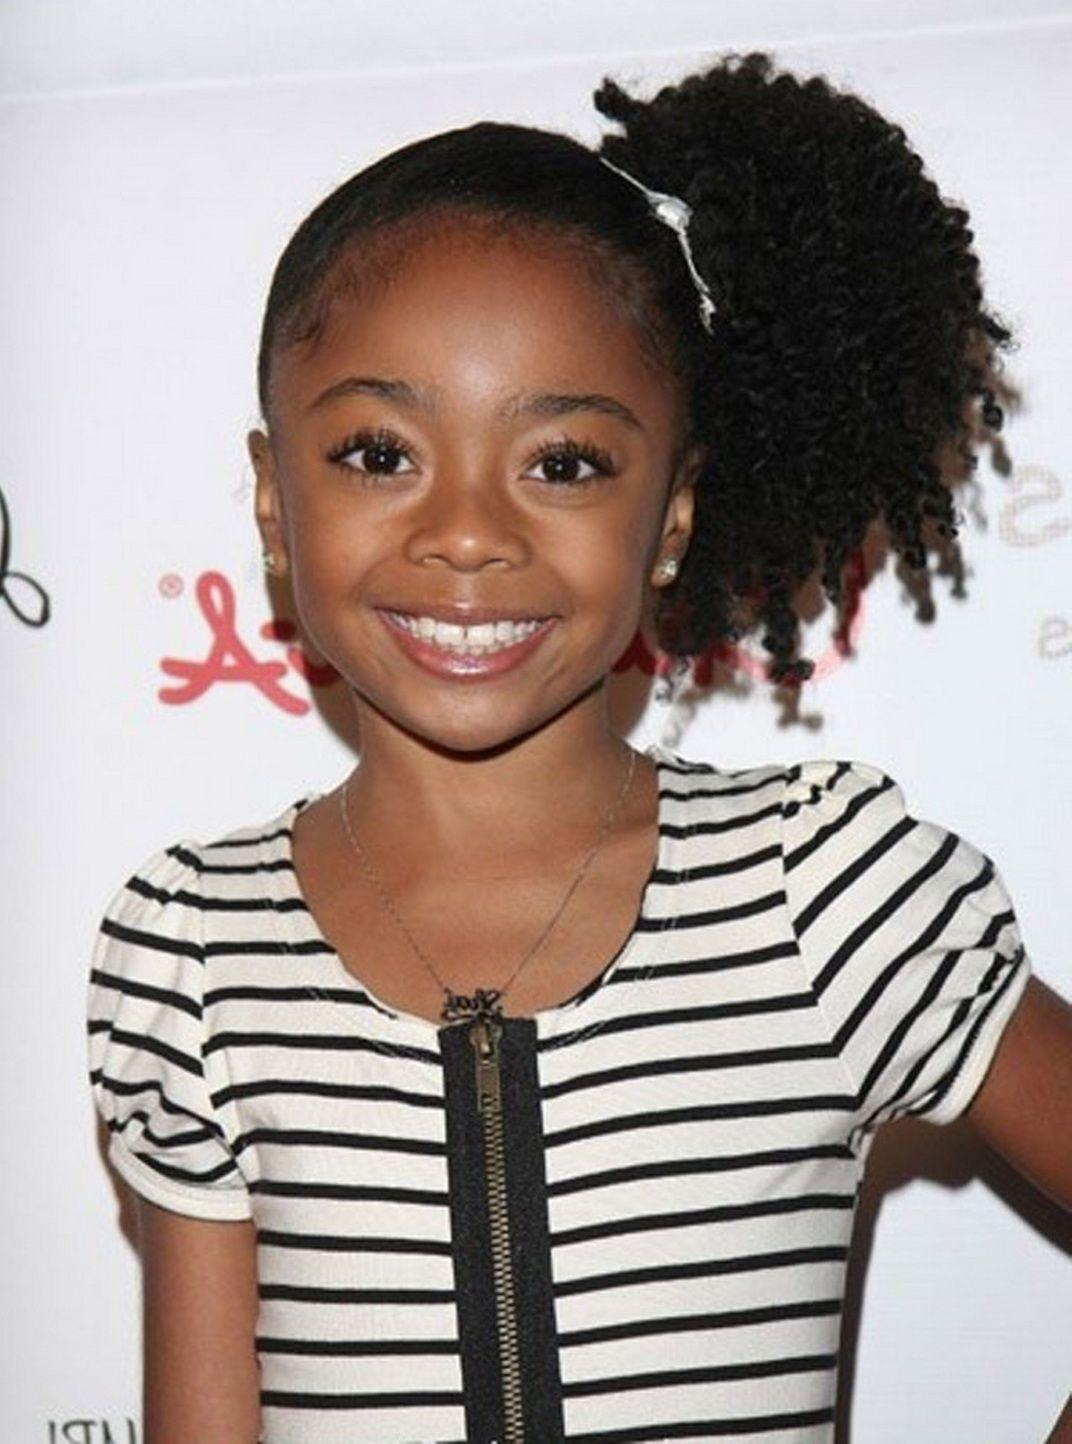 Sensational 1000 Images About Hairstyles On Pinterest Black Little Girls Short Hairstyles Gunalazisus